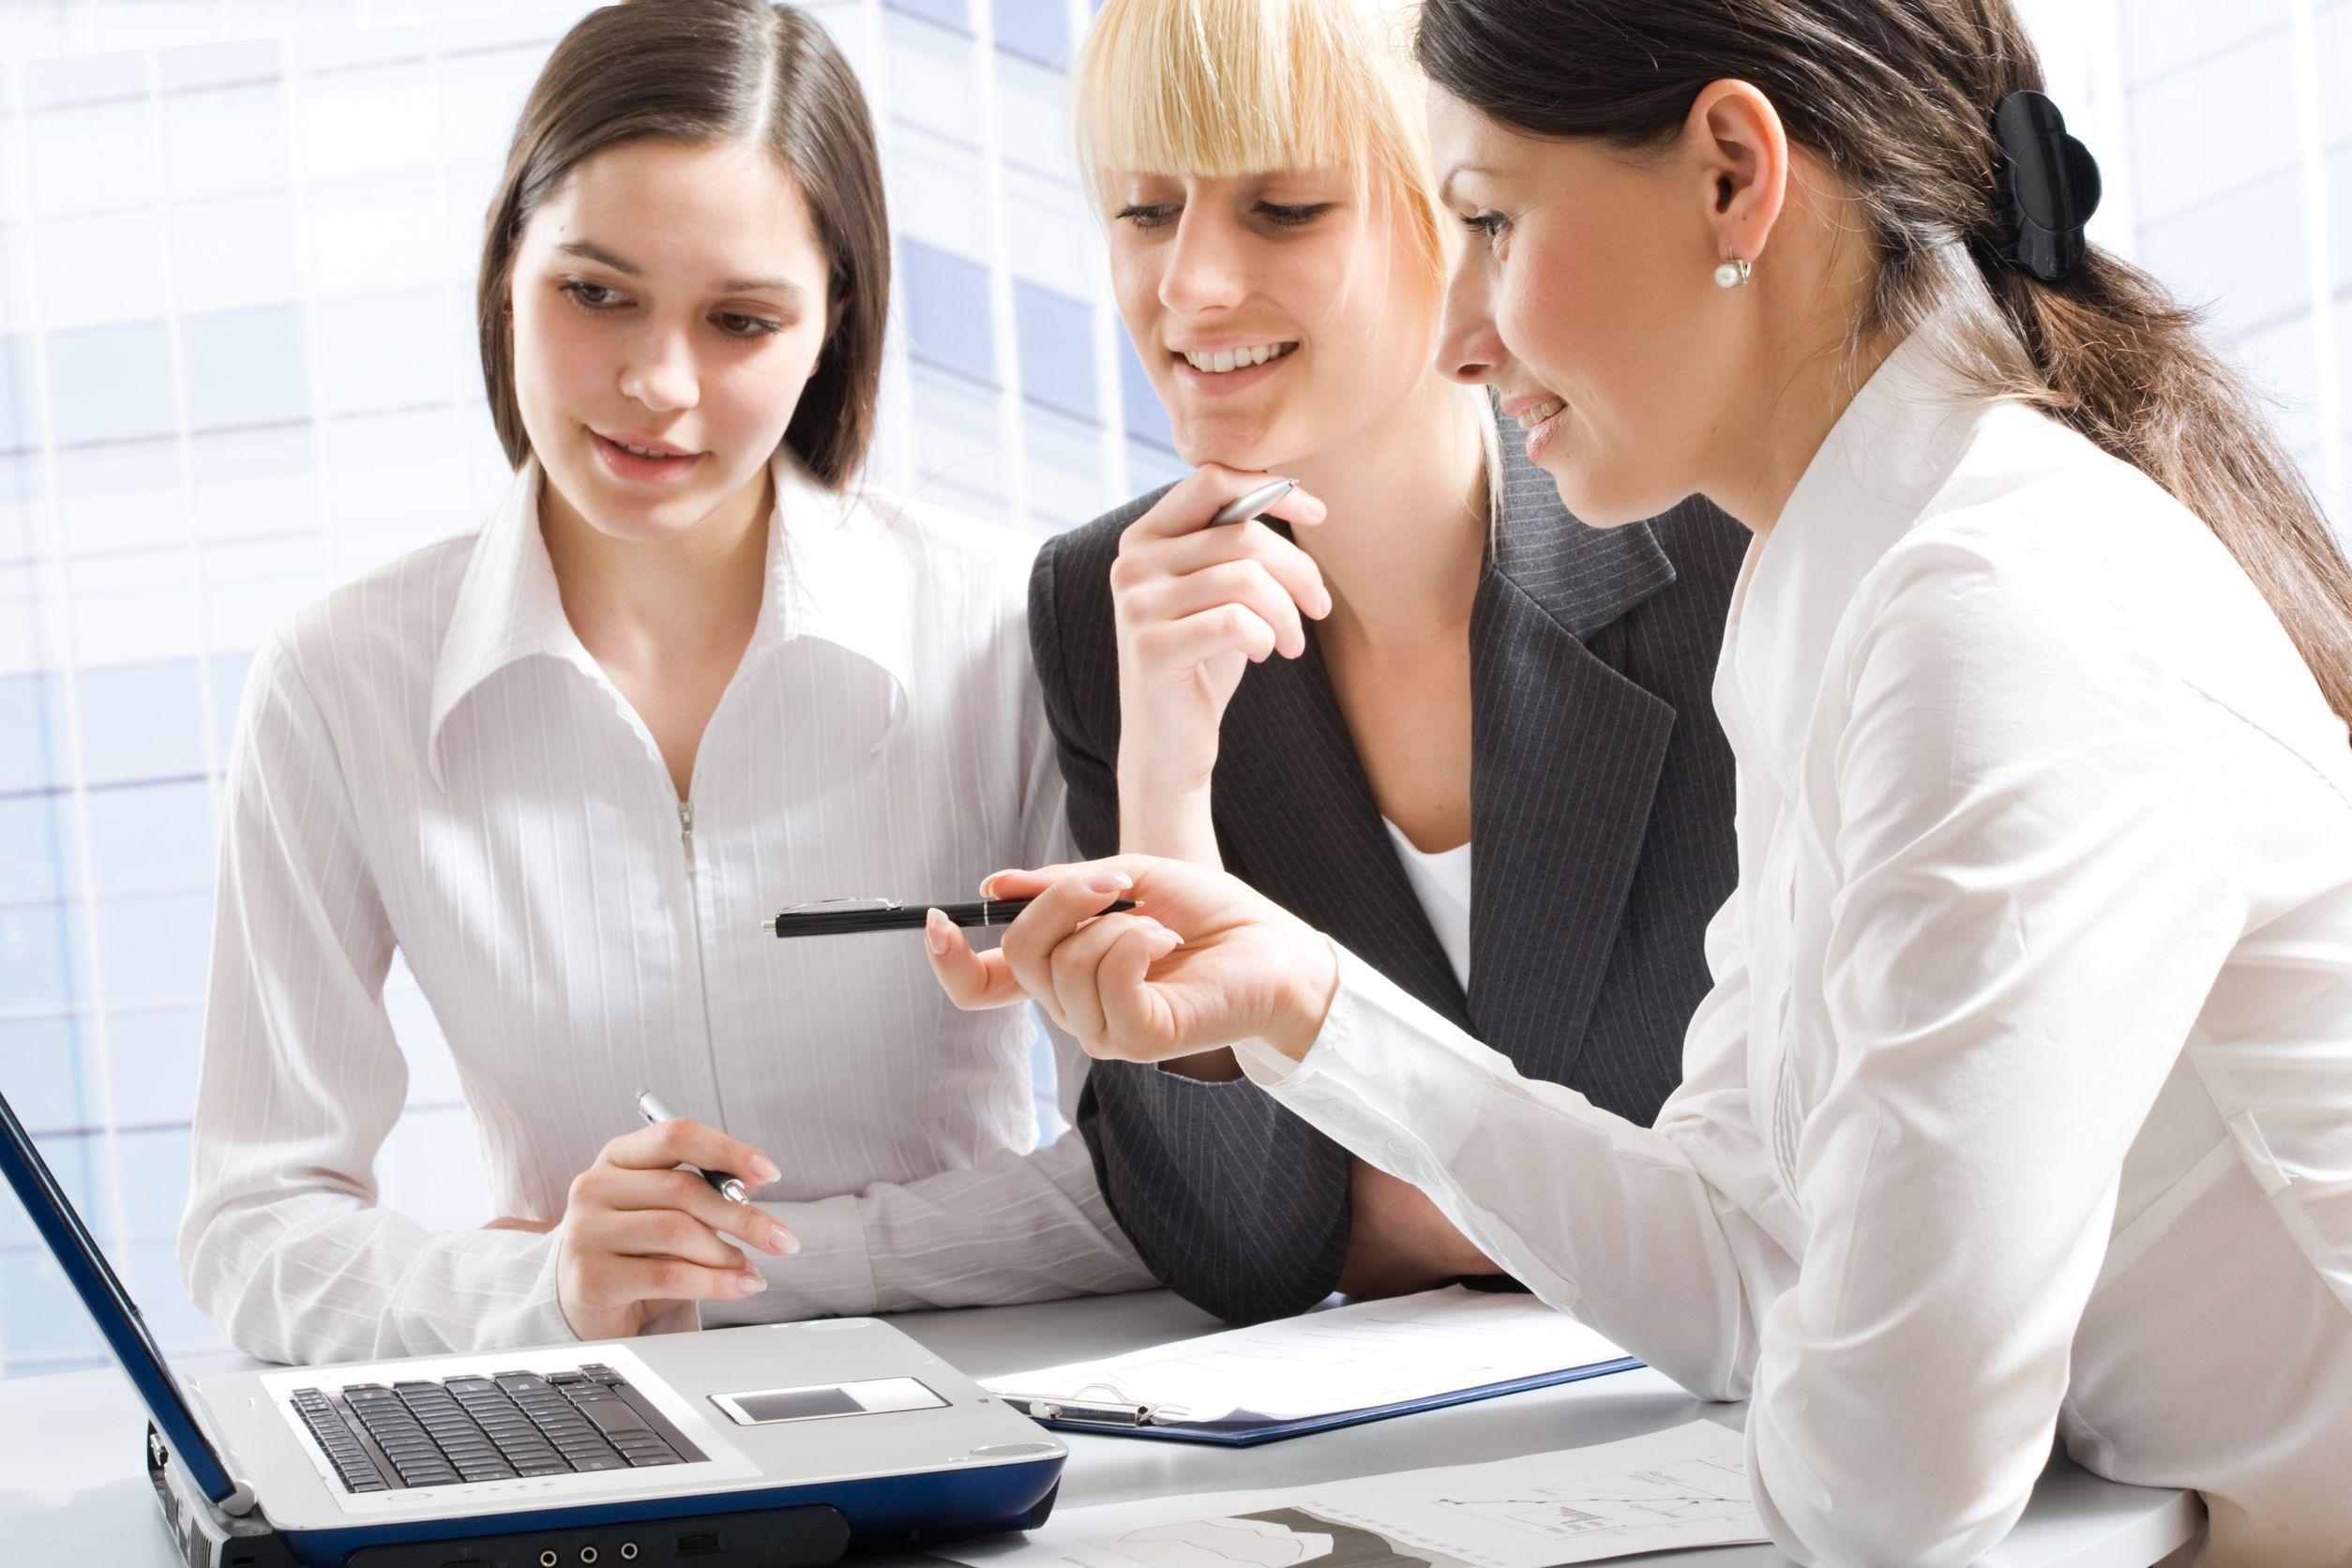 business-orgs-for-women.jpg